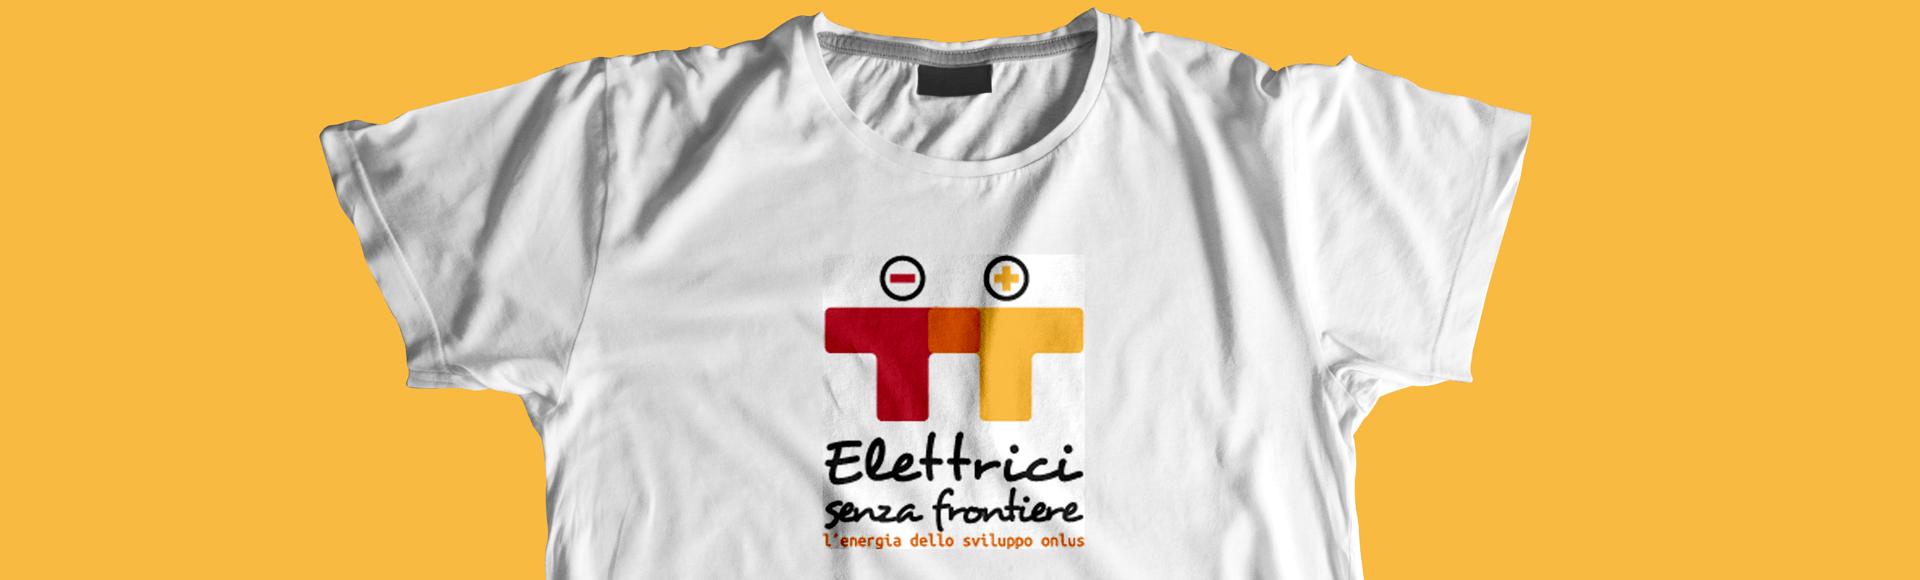 Elettrici senza frontiere onlus